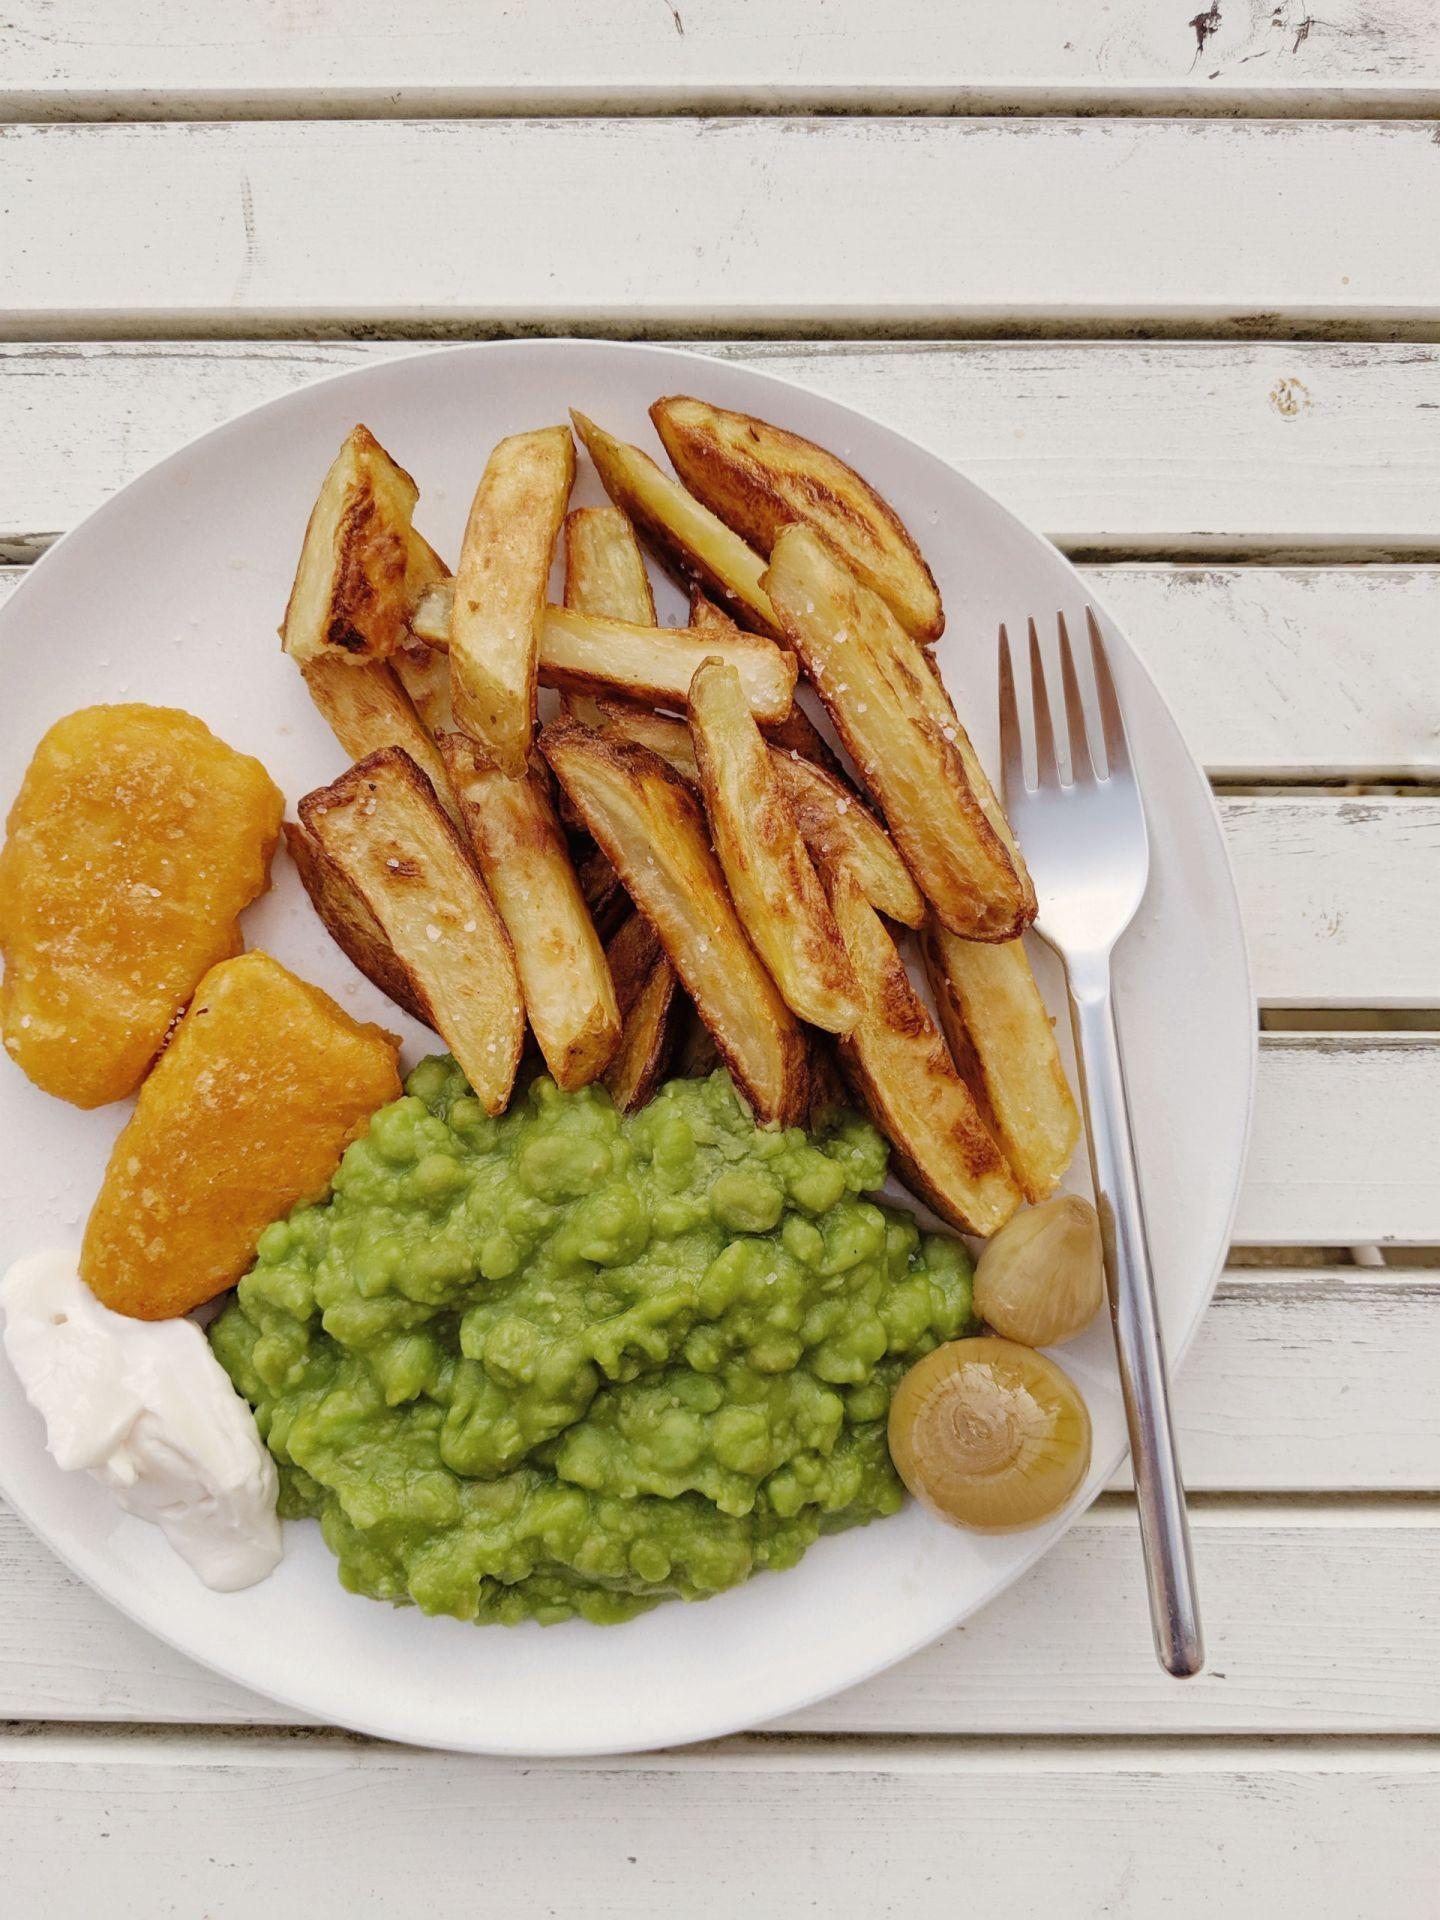 Vegan Fish n' Chips with Mushy Peas